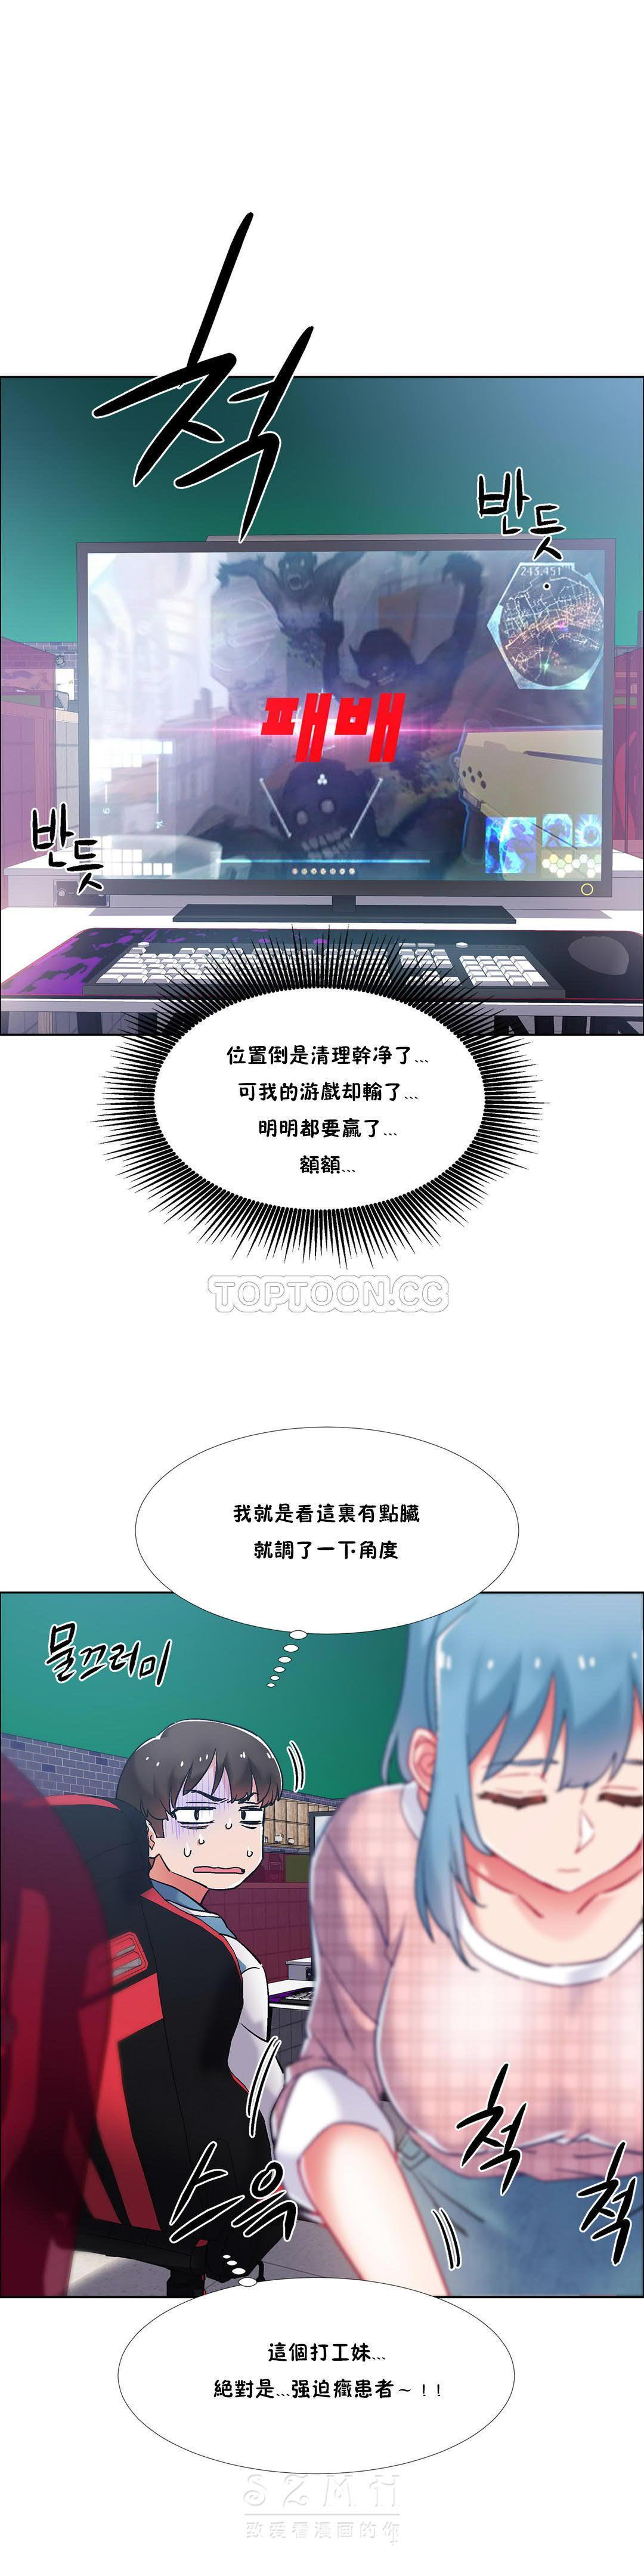 [Studio Wannabe] Rental Girls | 出租女郎 Ch. 33-58 [Chinese]  第二季 完结 47